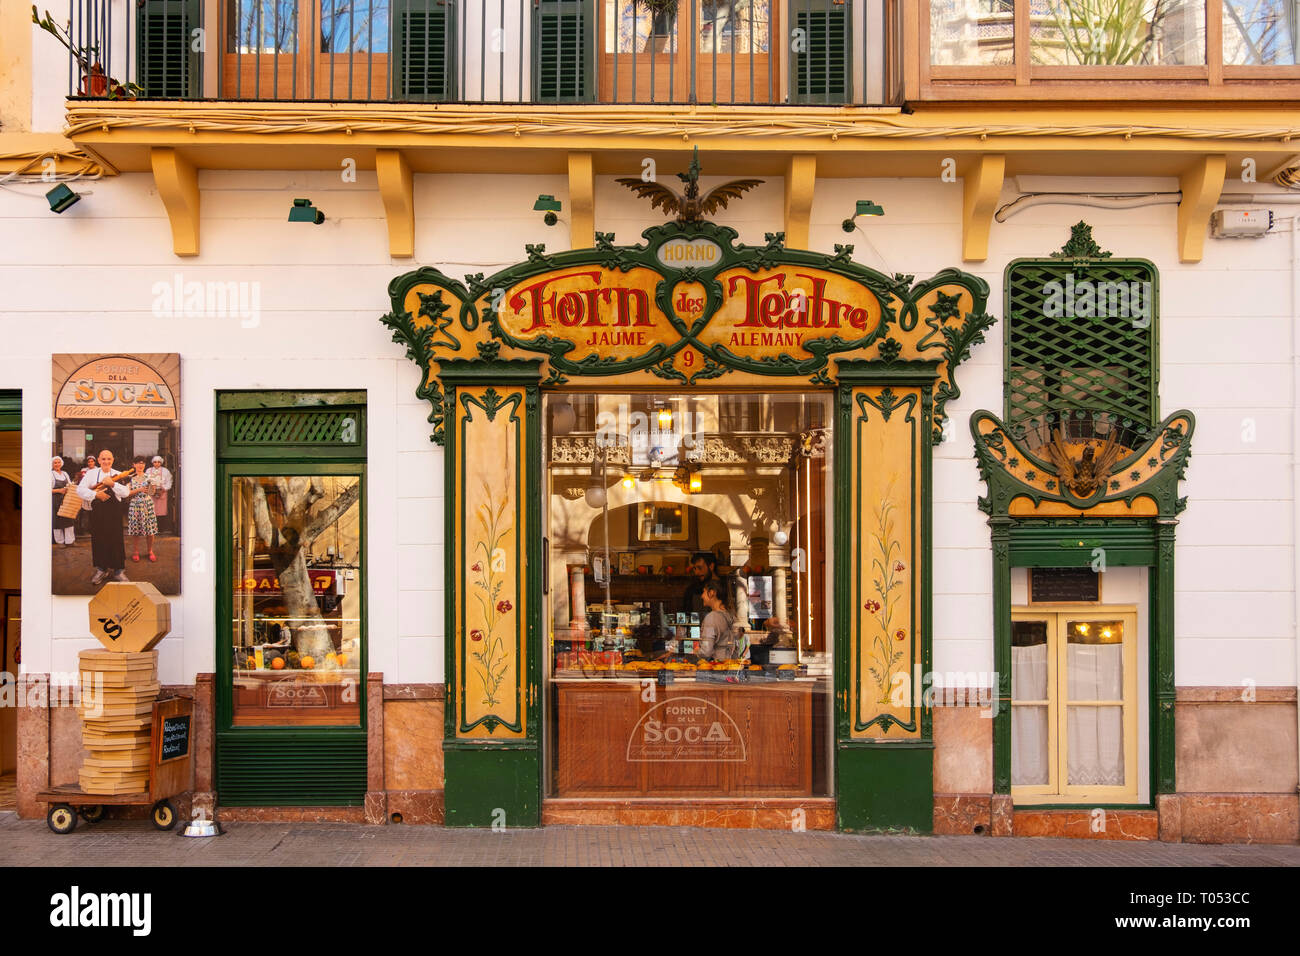 Typical Pastry shop Forn de Teatre, Palma de Mallorca. Majorca, Balearic Islands, Spain Europe - Stock Image